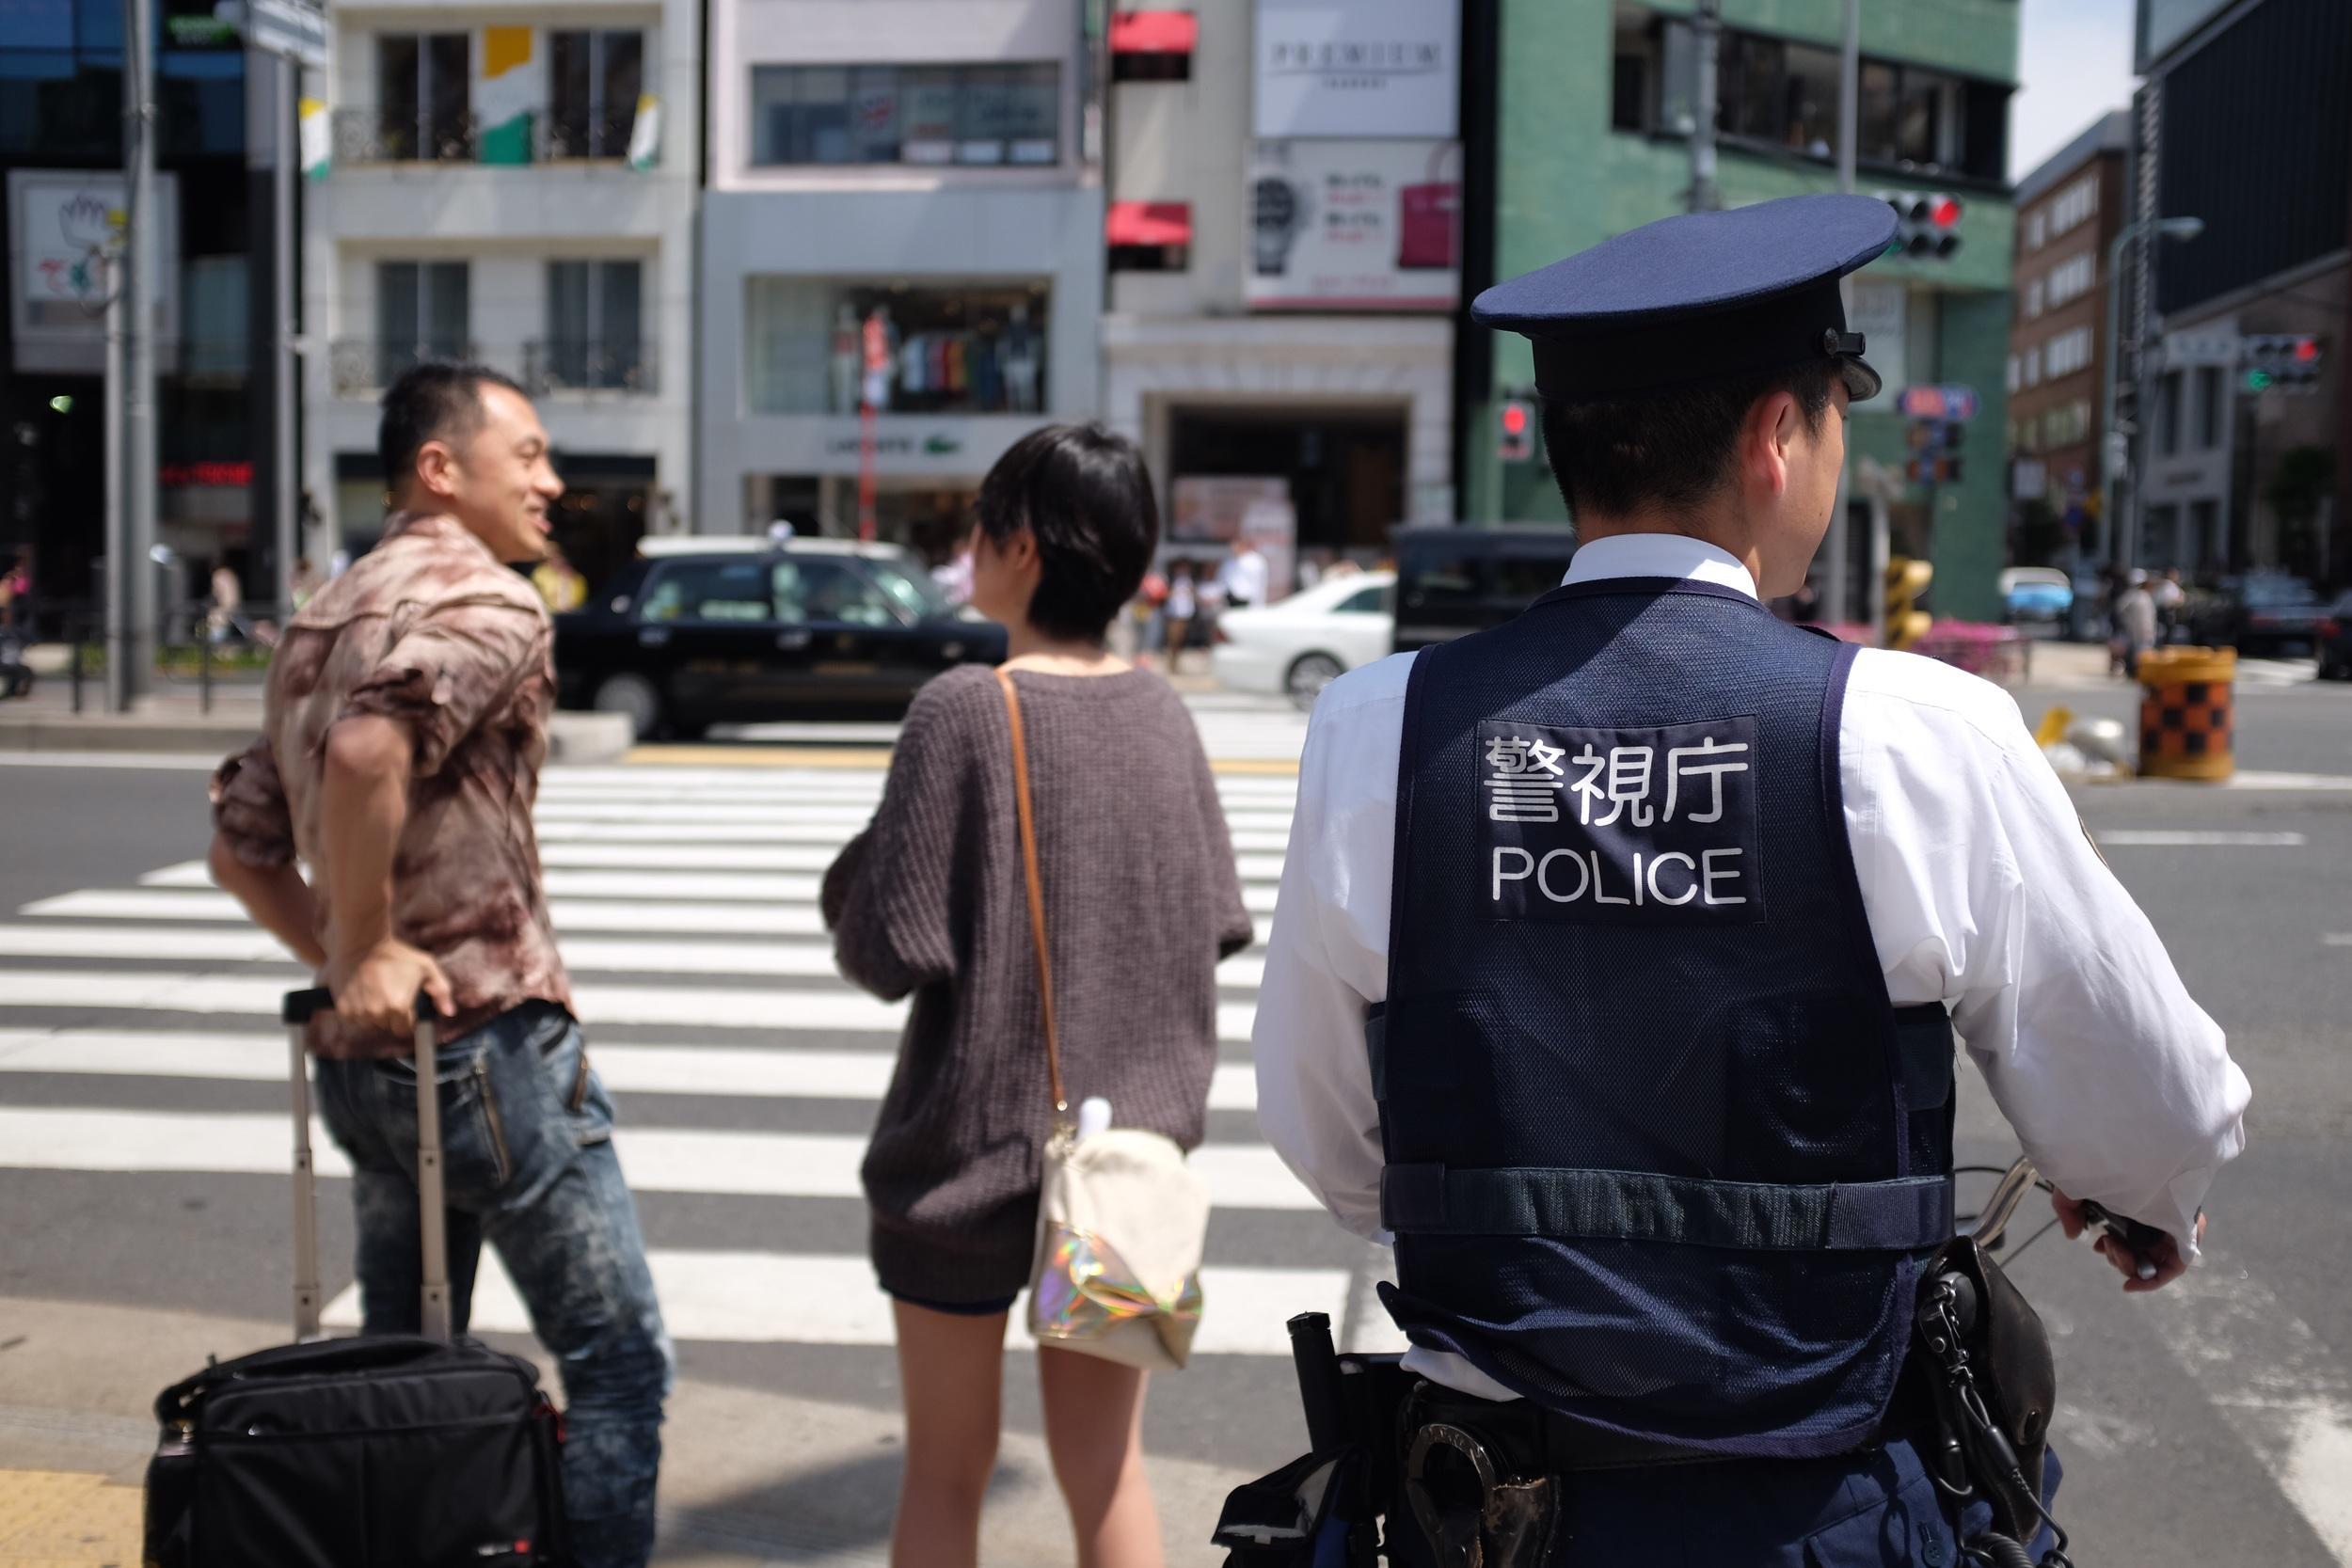 A policeman waits to cross at Aoyama dori near Omotesando station, Tokyo. Fujifilm x100t, ISO 200, f/2, 1/600 sec. ND filter on. No edit, straight out of camera.